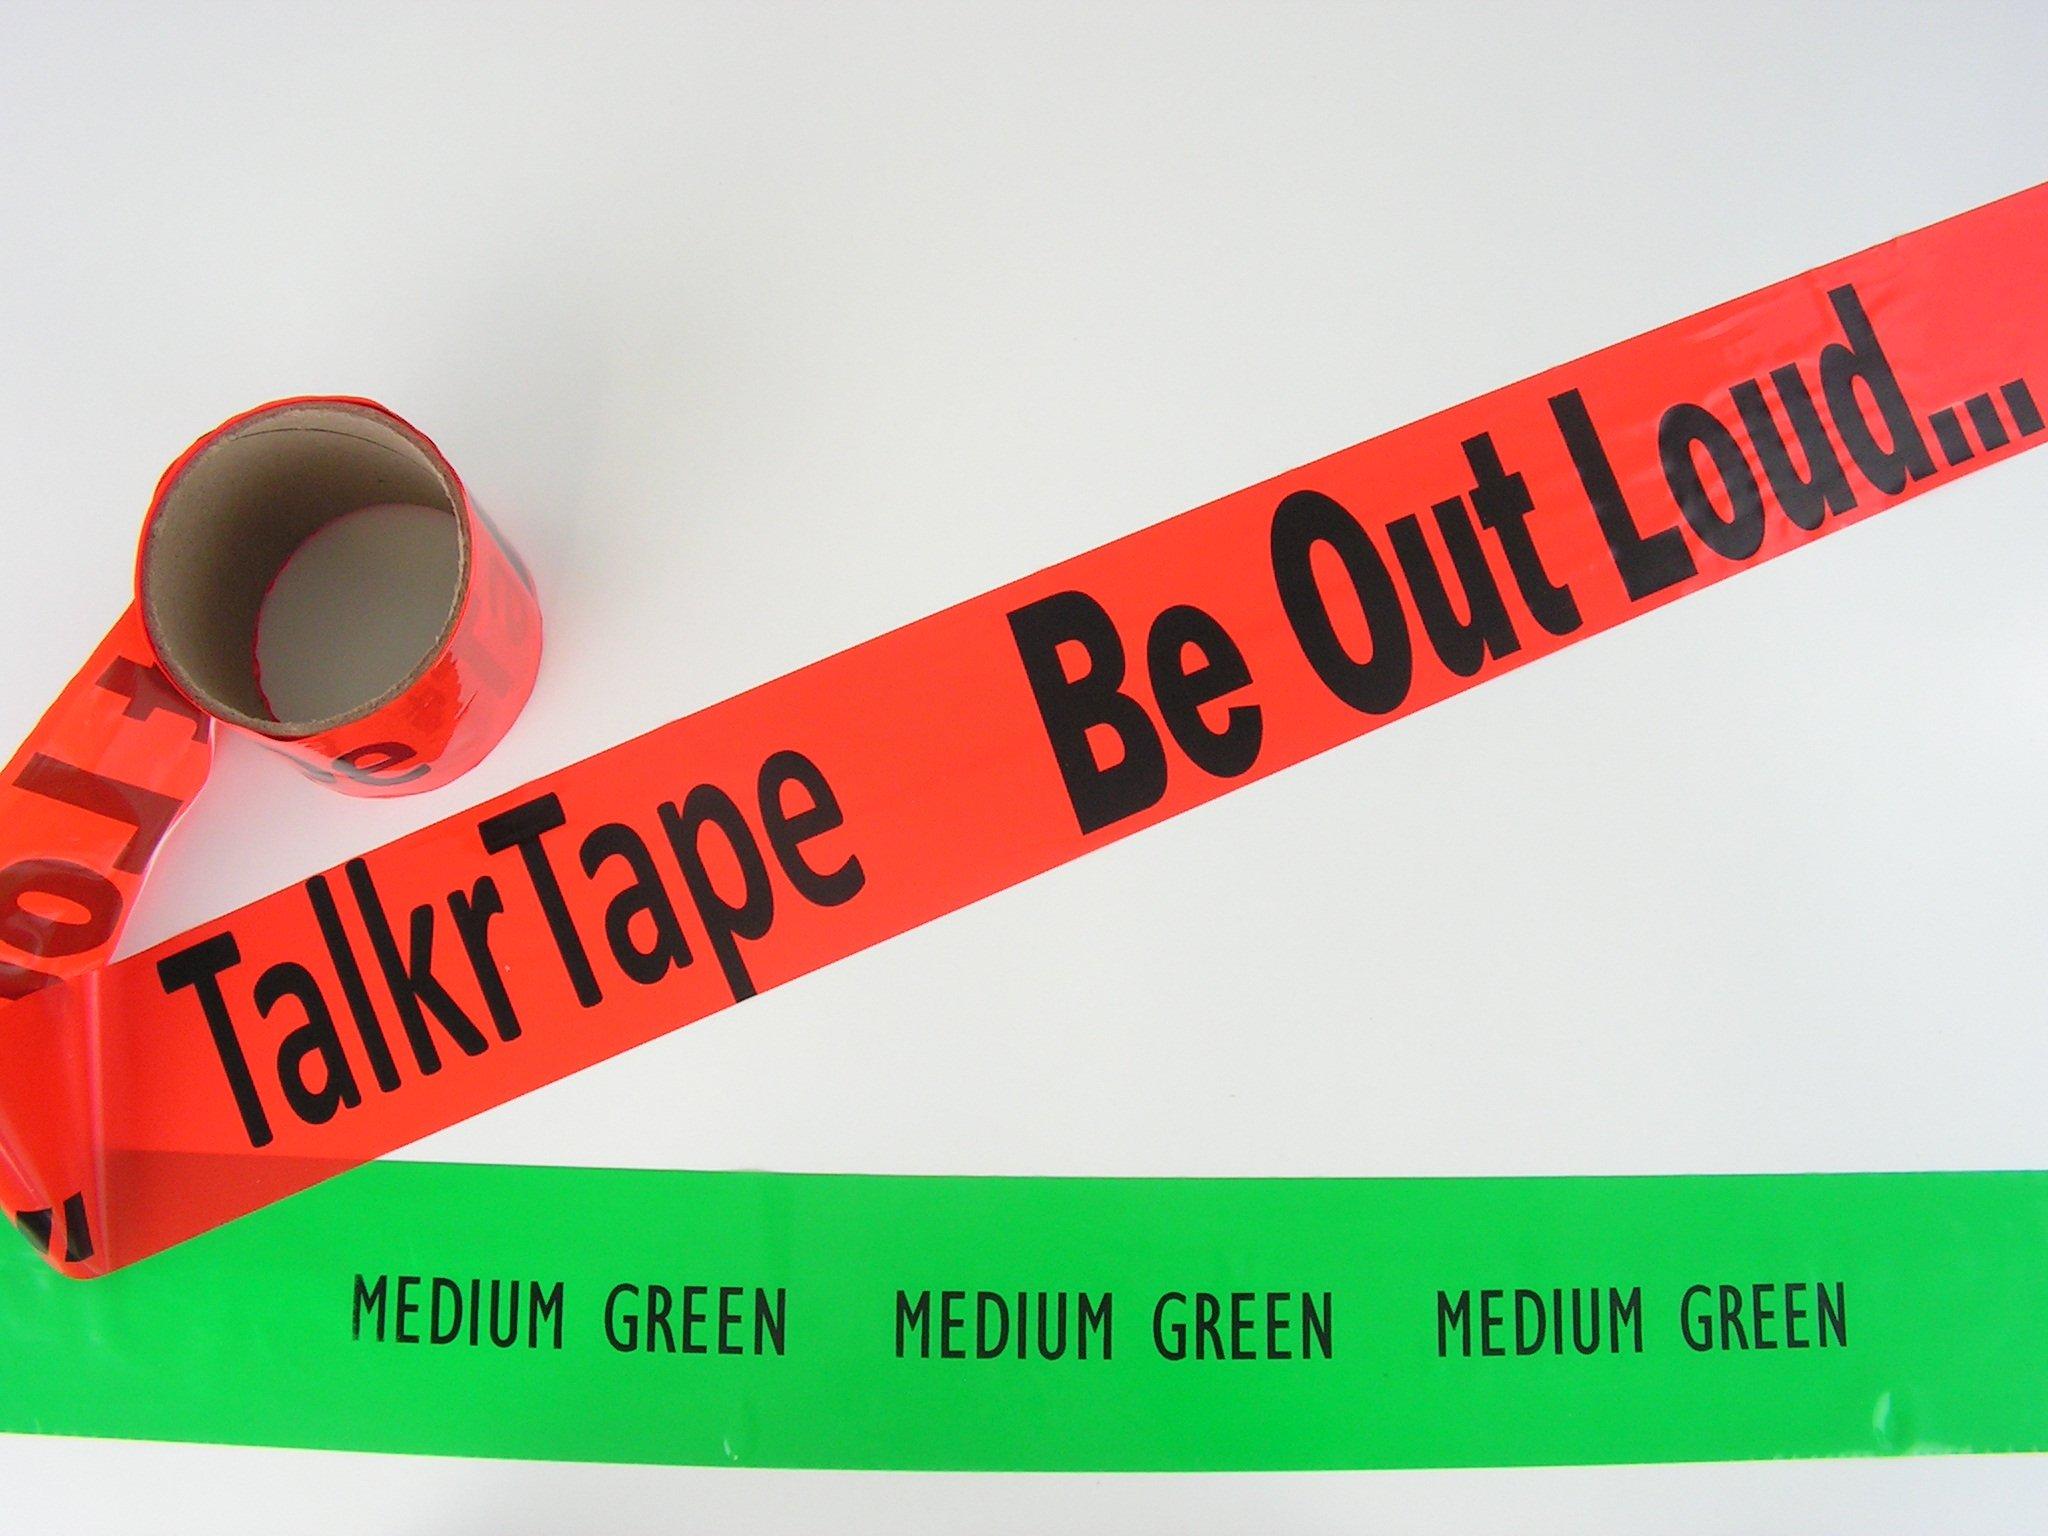 Custom Caution Tape Medium Green Custom Barricade Tape 100' Roll, Made in USA